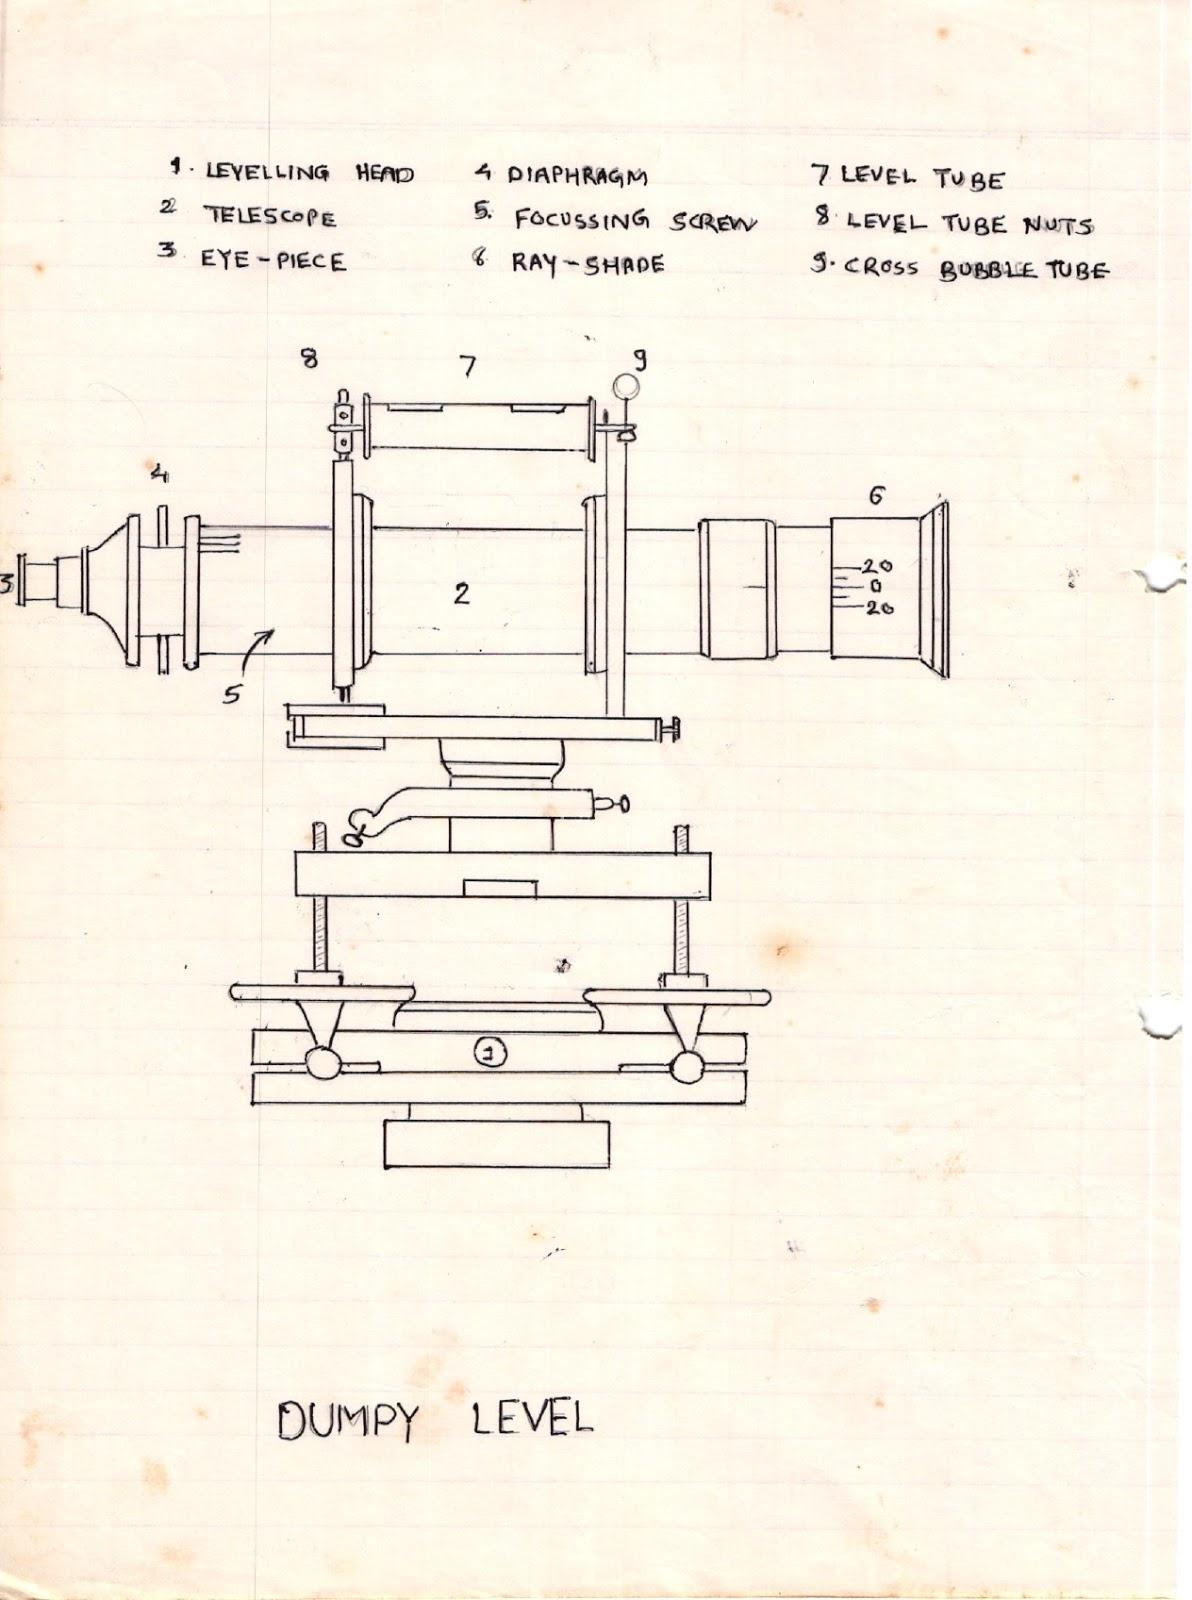 Parts Of A Telescope Diagram Vav Box Wiring Civil At Work Study Dumpy Level